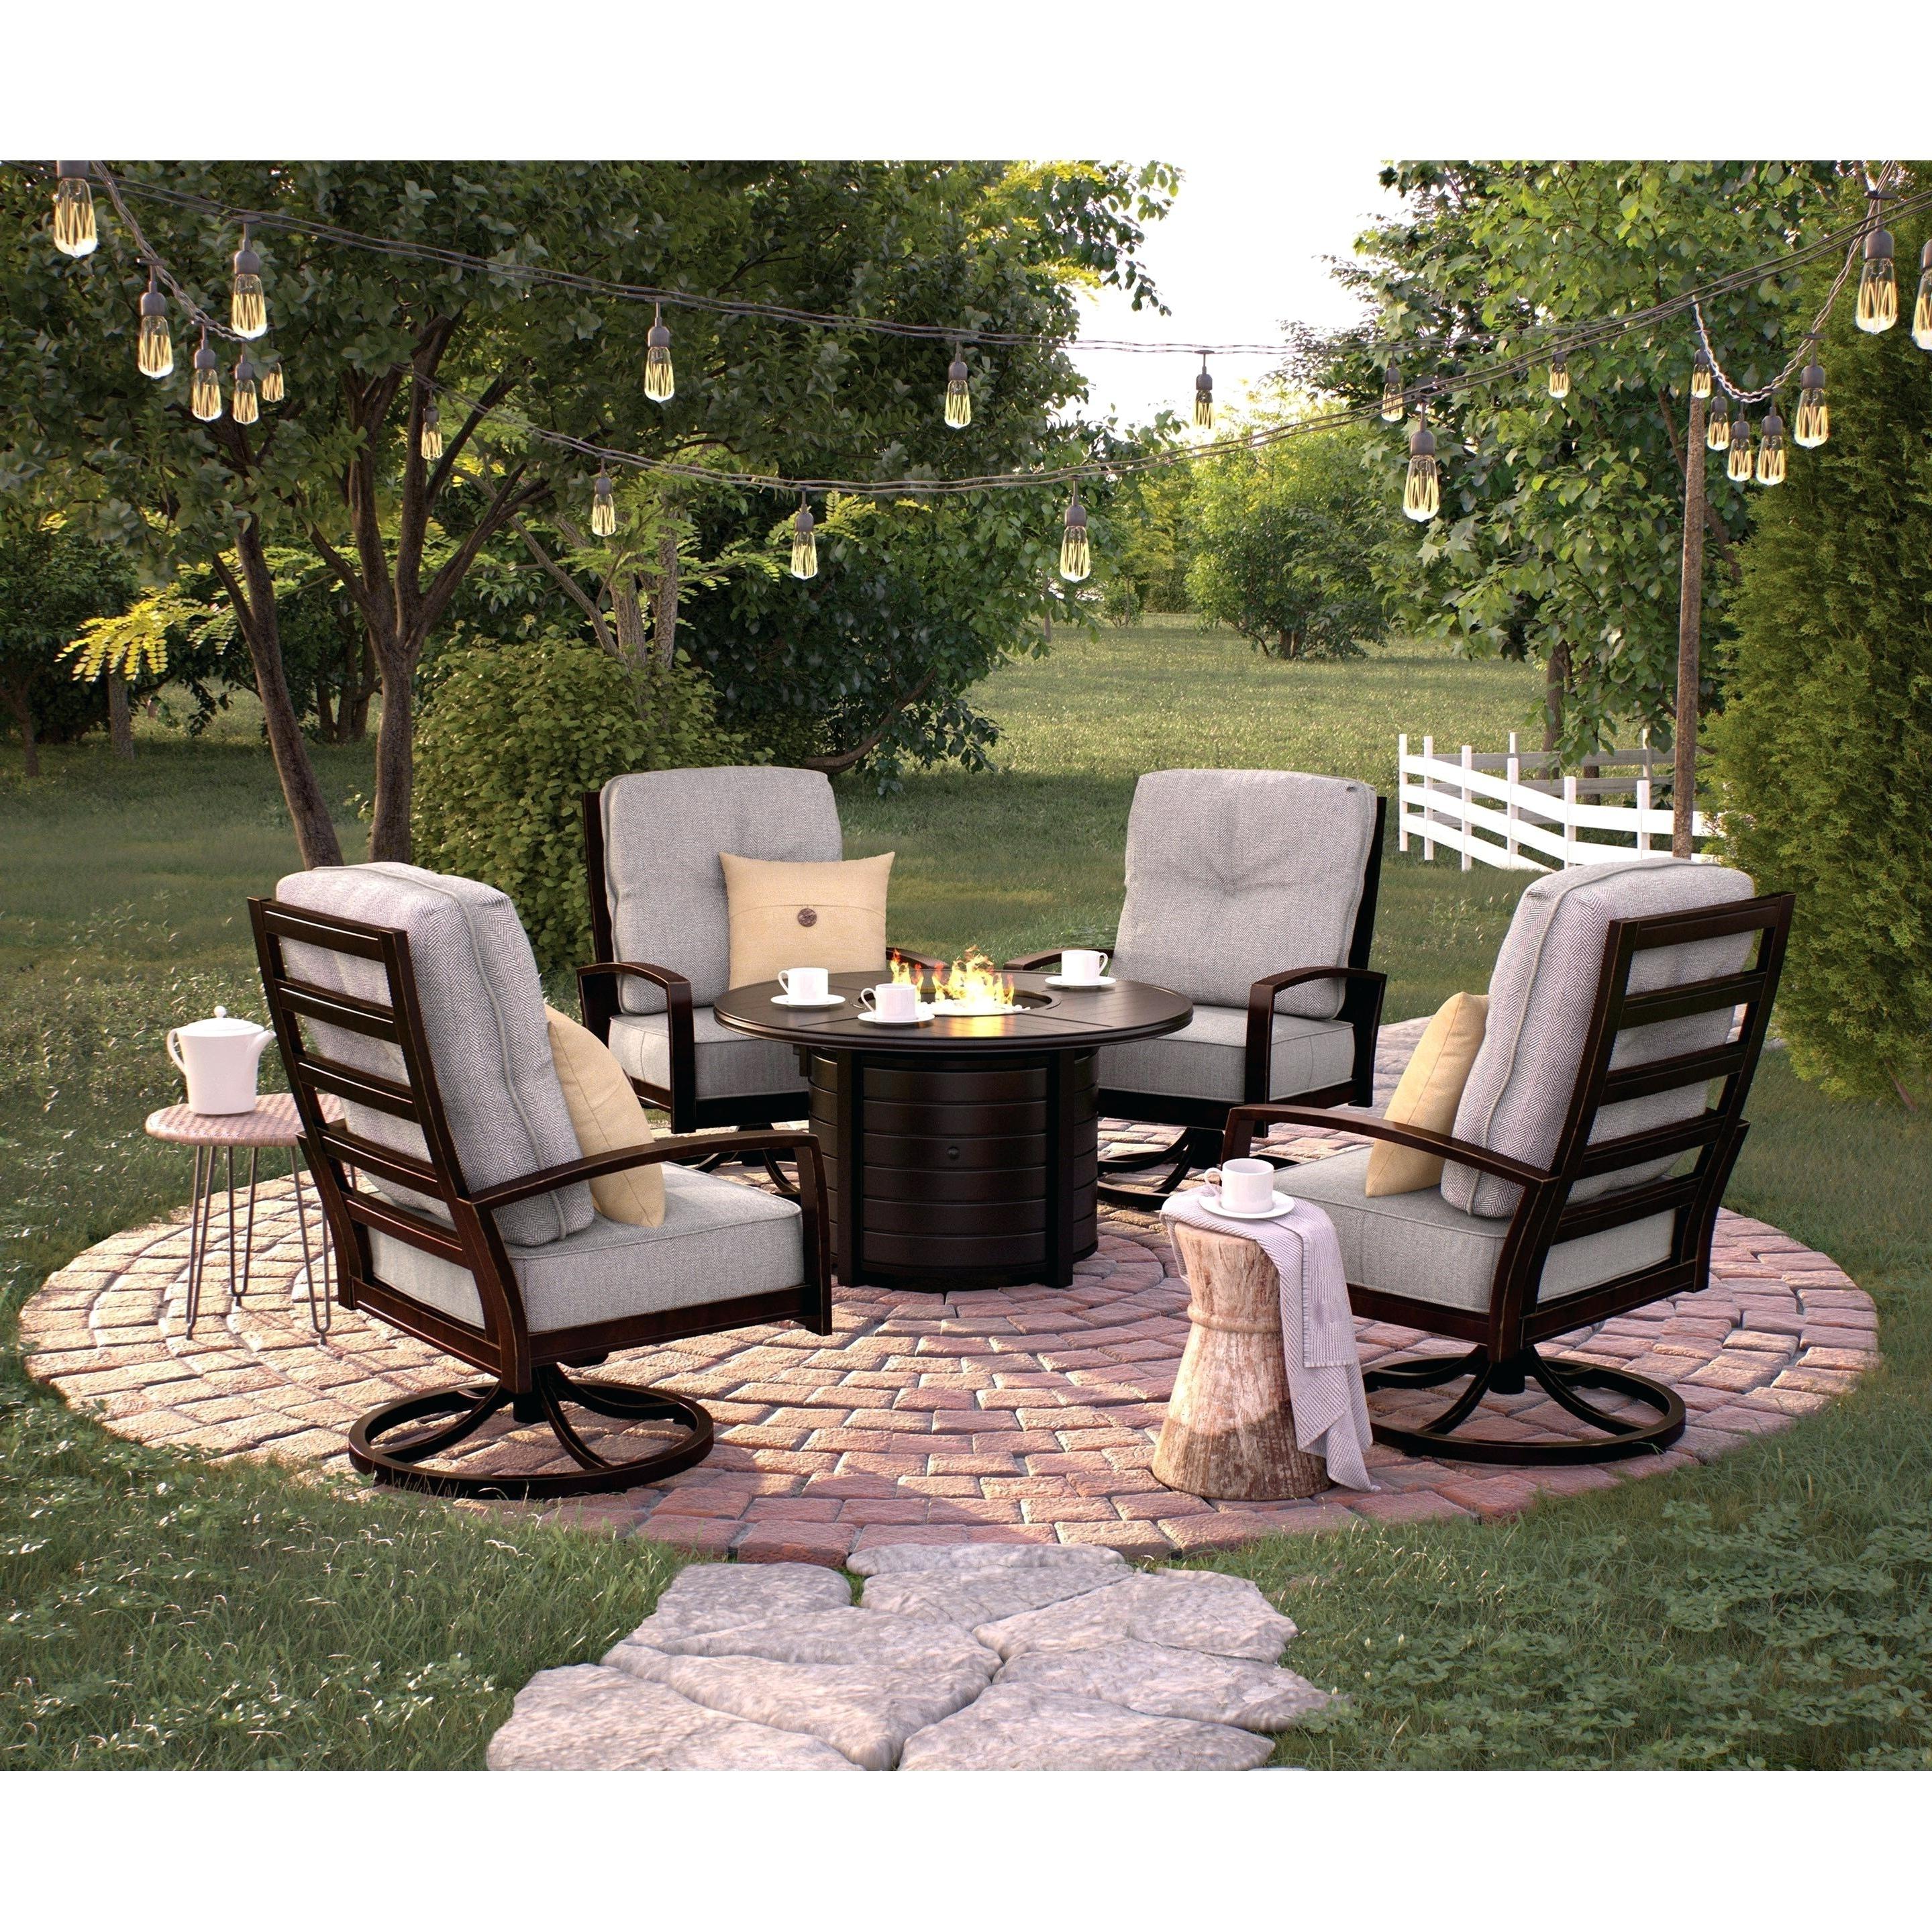 Wayfair Outdoor Patio Conversation Sets Throughout Popular Target Patio Furniture Conversation Sets Wayfair Patio Furniture (View 4 of 15)